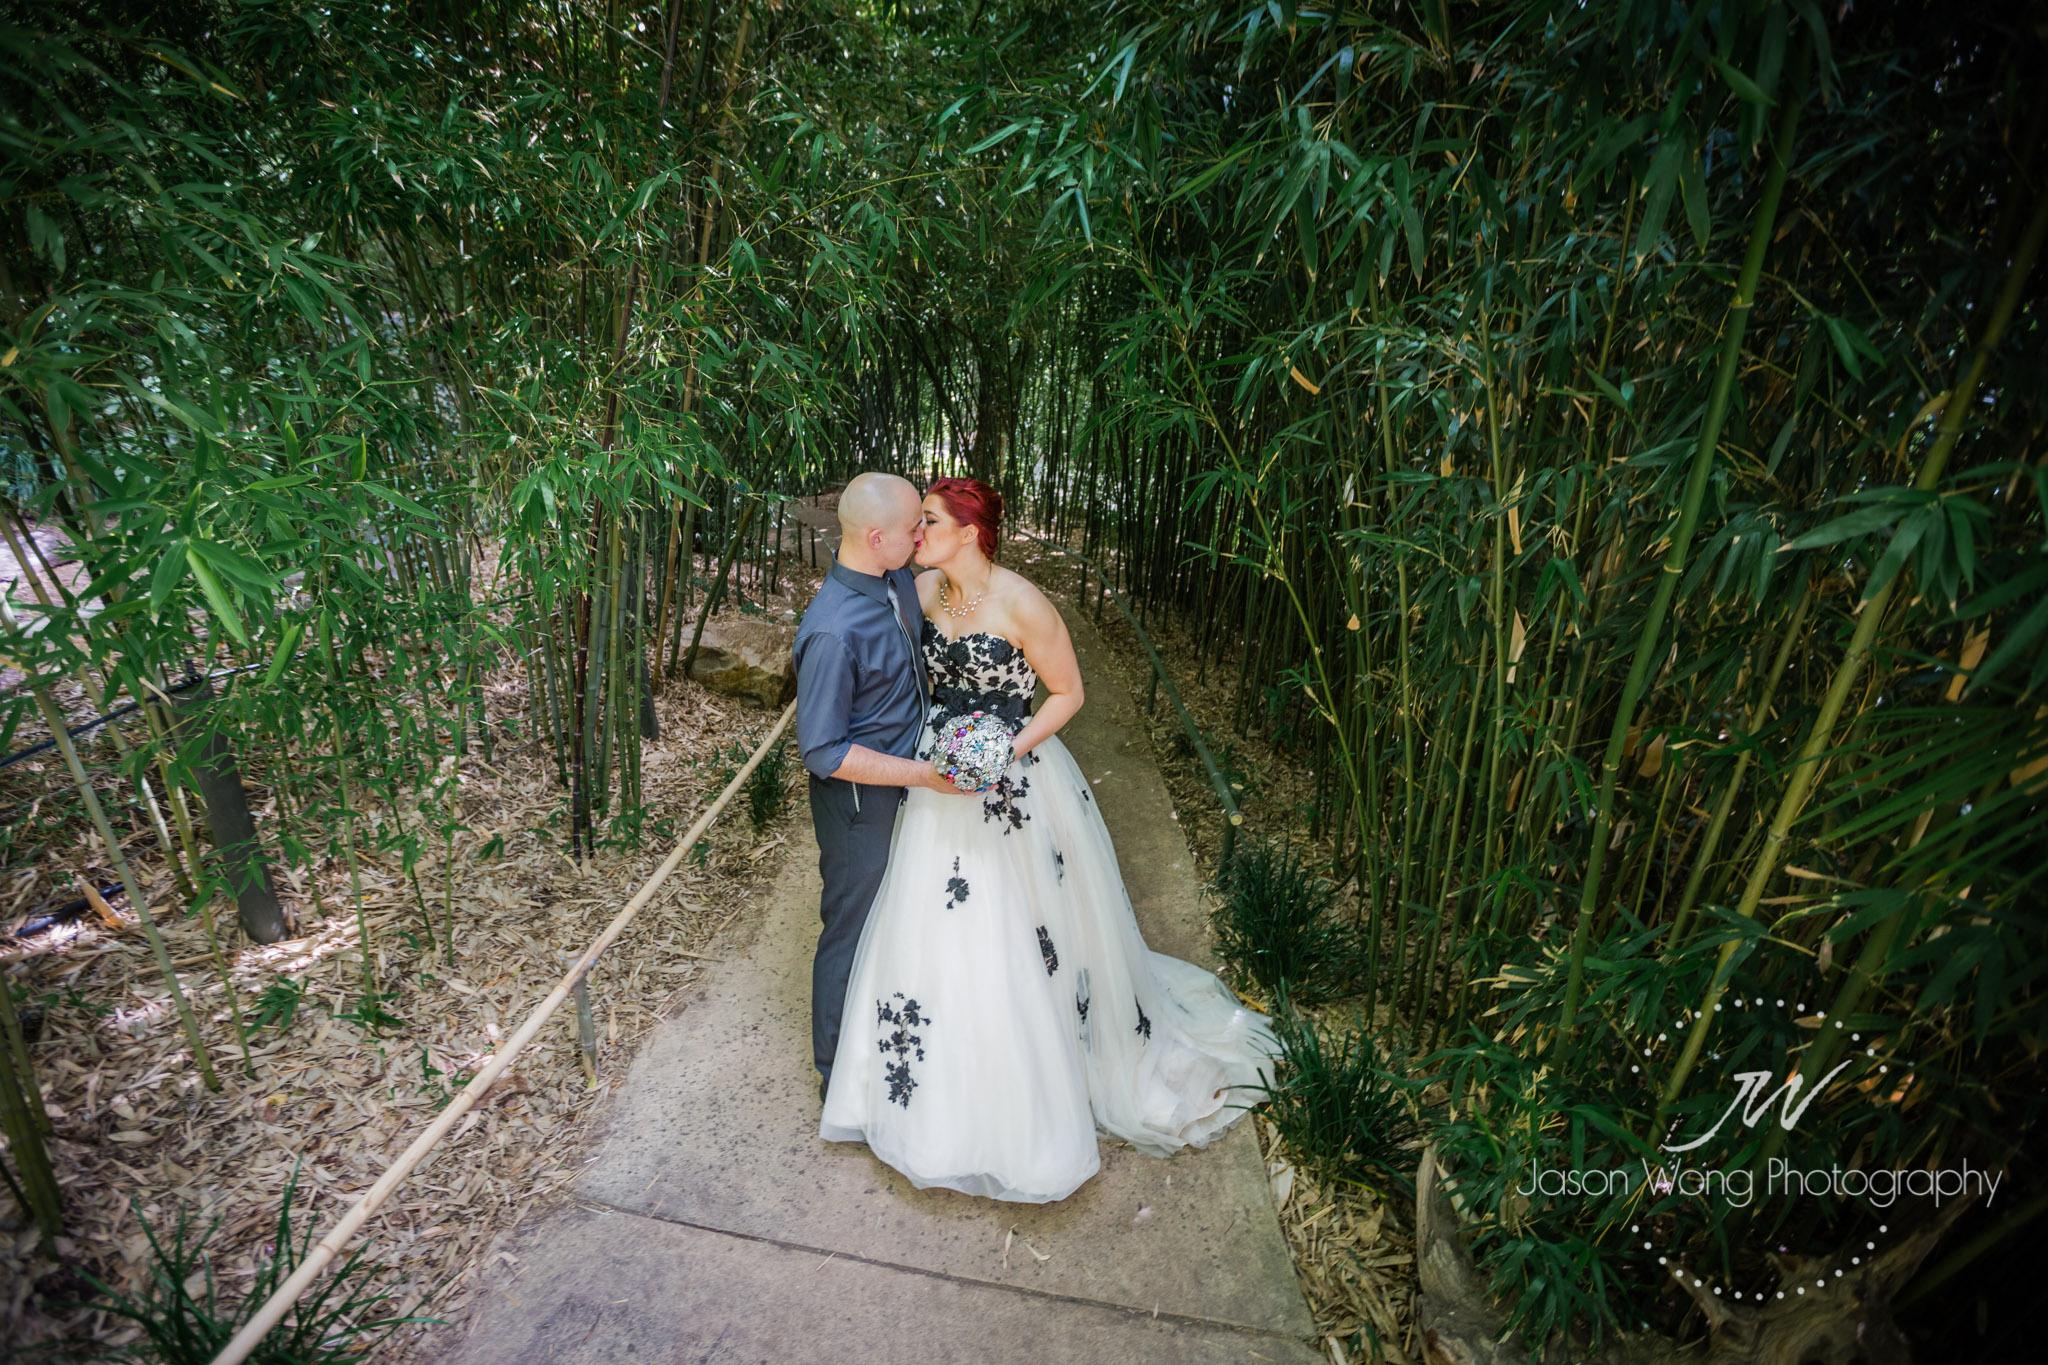 bridal-photoshoot-adelaide-botanica-garden-bamboo.jpg